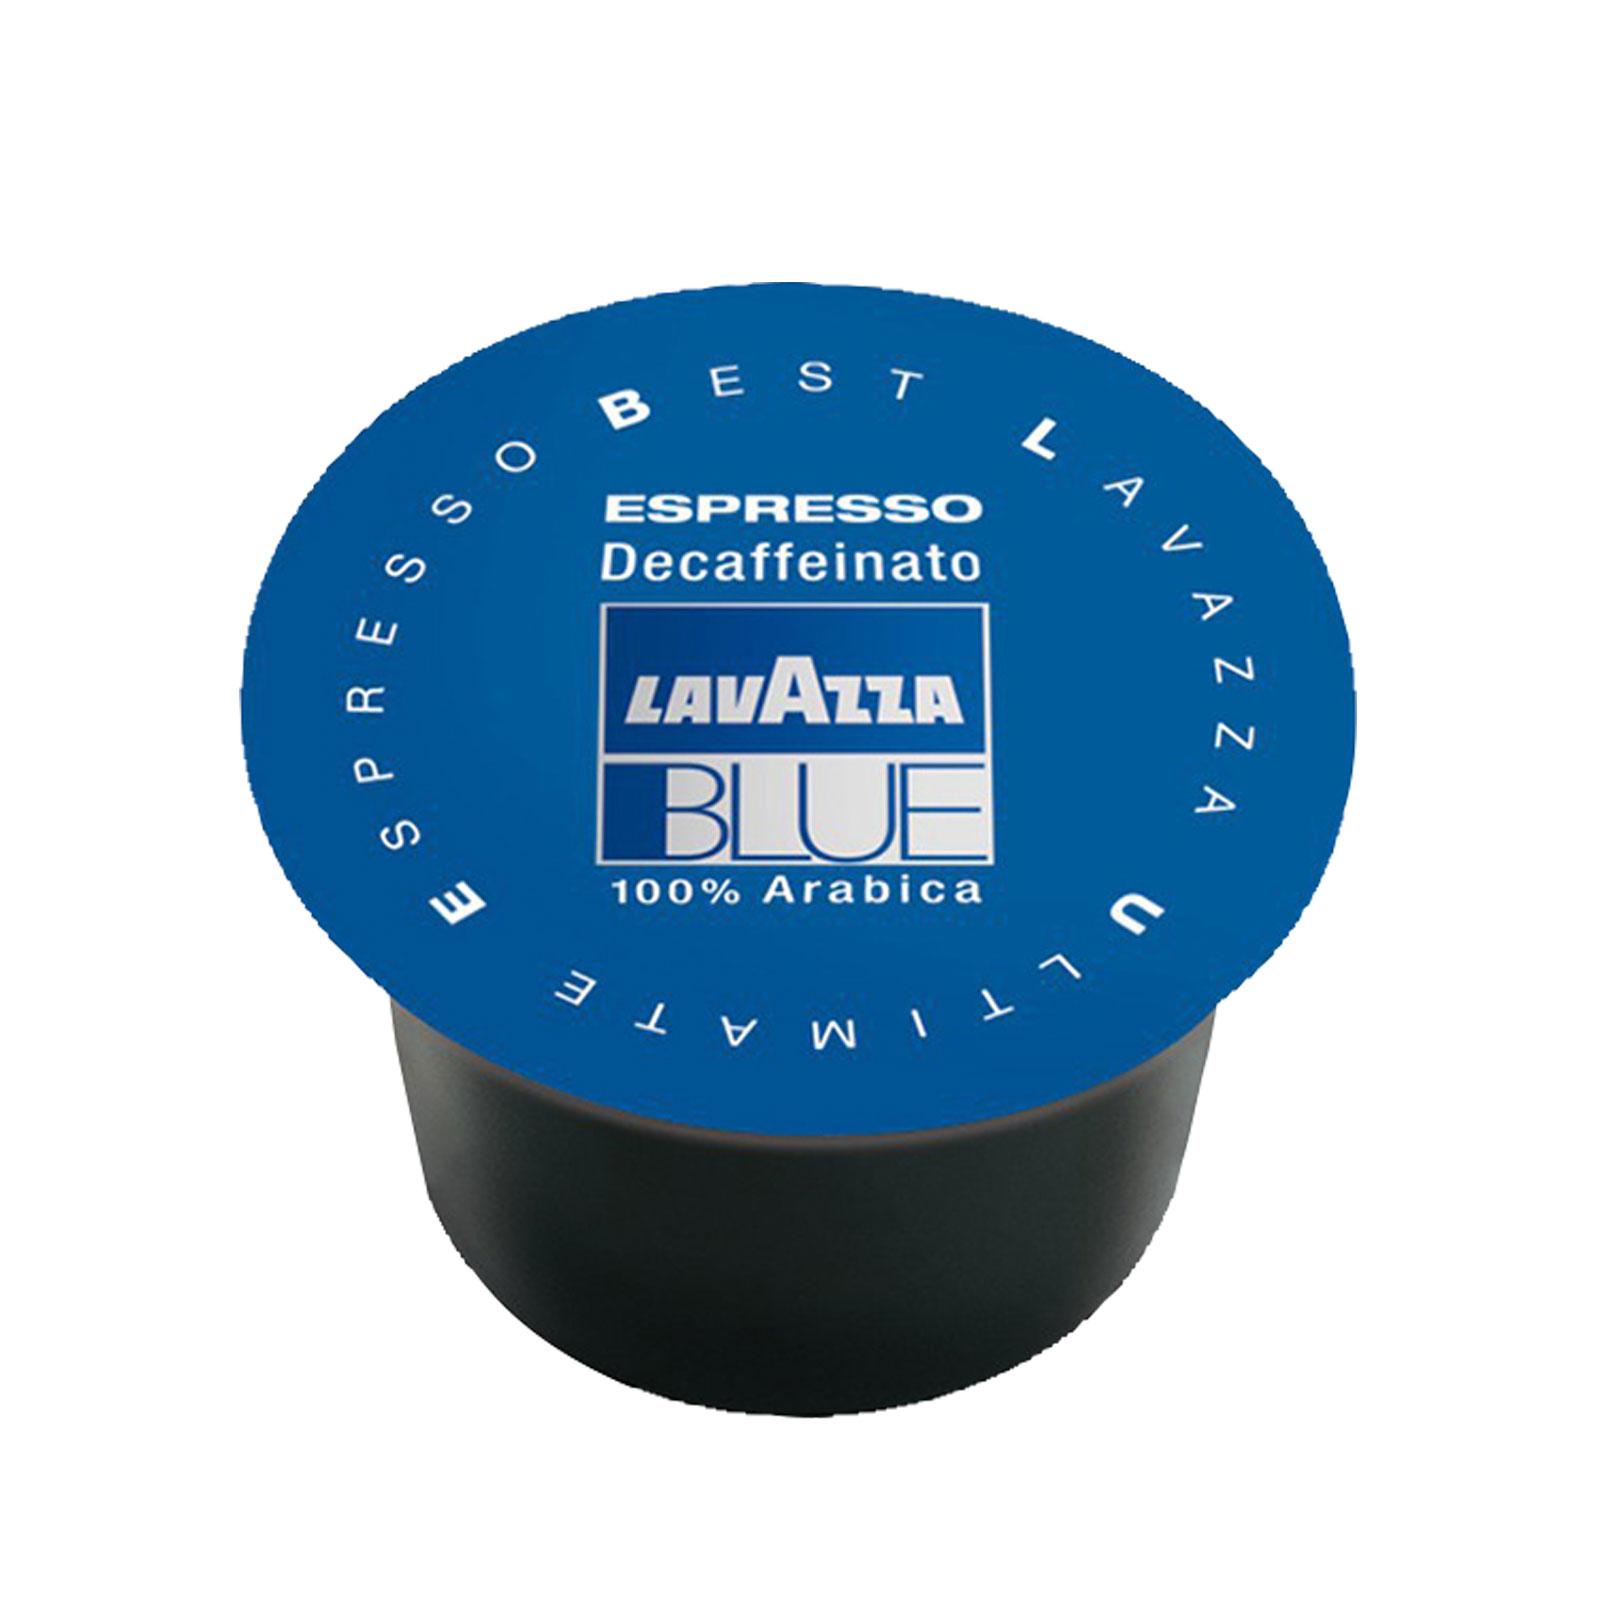 Lavazza Blue Espresso Decaffeinato entkoffeiniert Kapsel Nr. 800 - 100Stk Kaffee-Kapseln für Kapselmaschine